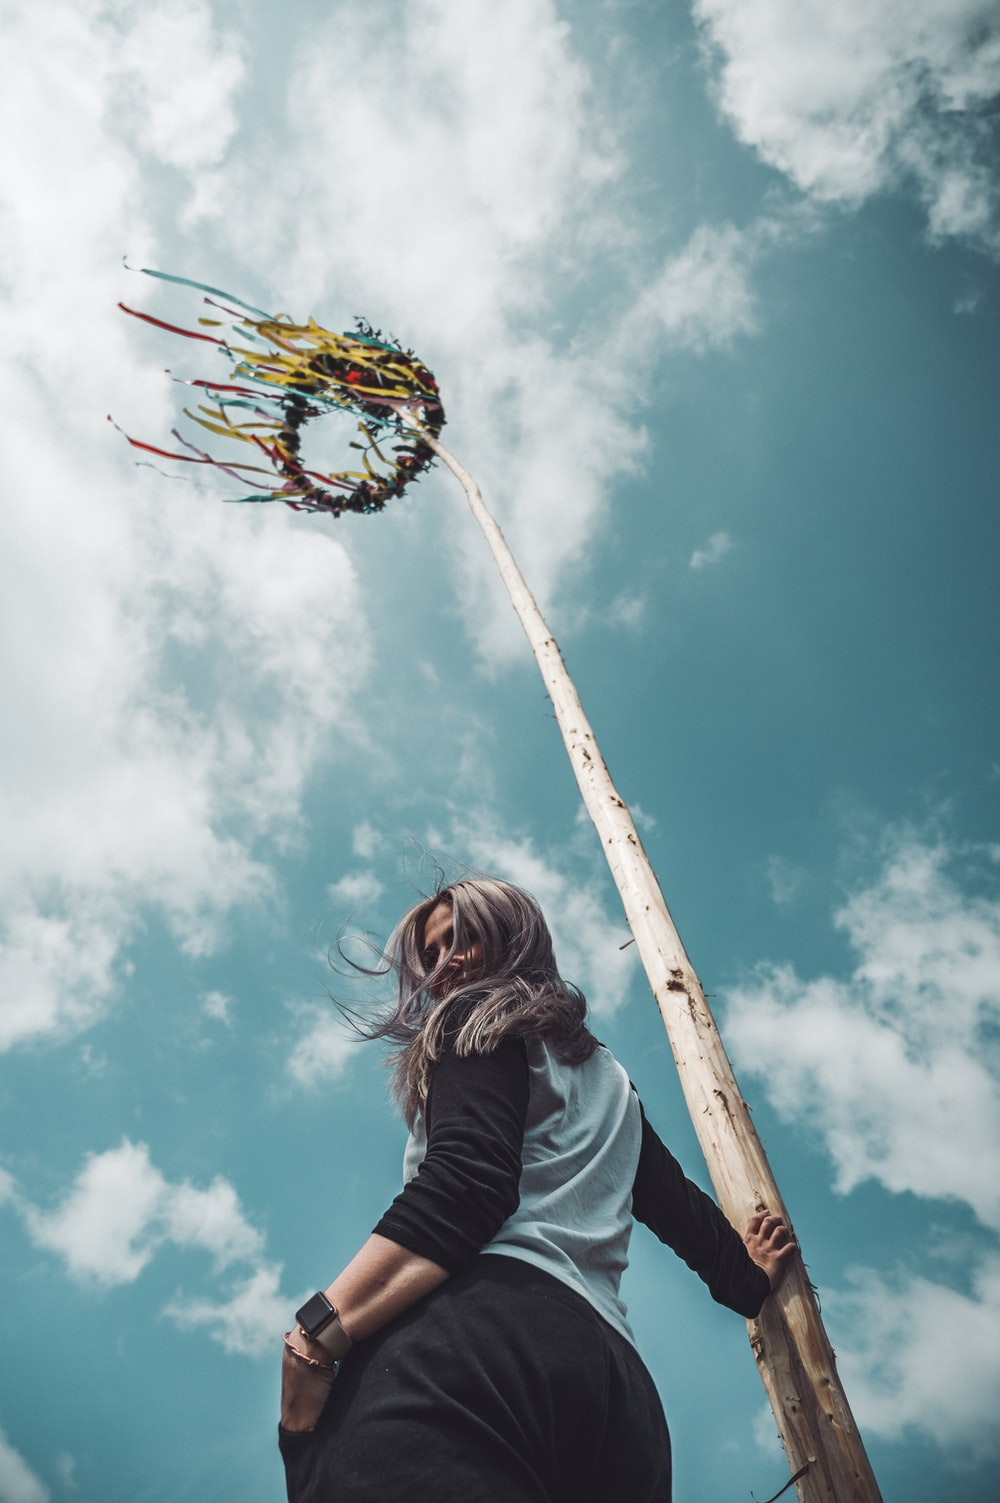 woman standing near pole